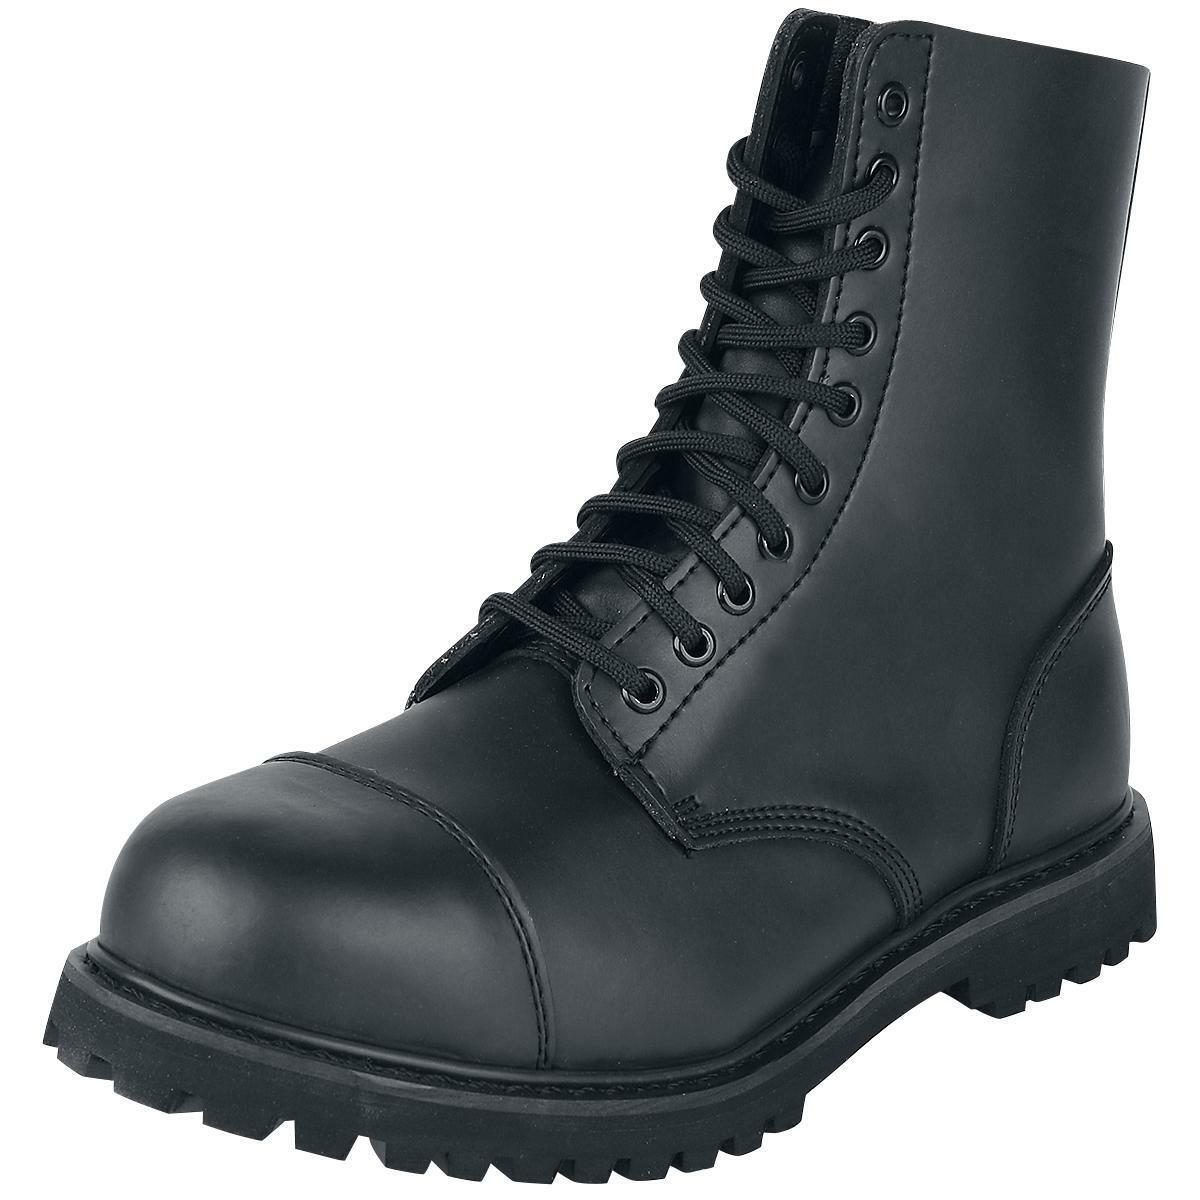 BRANDIT Anfibi Scarponi Stivali uomo donna militare Phantom stivali stivali stivali 10 eyelet 1be3df